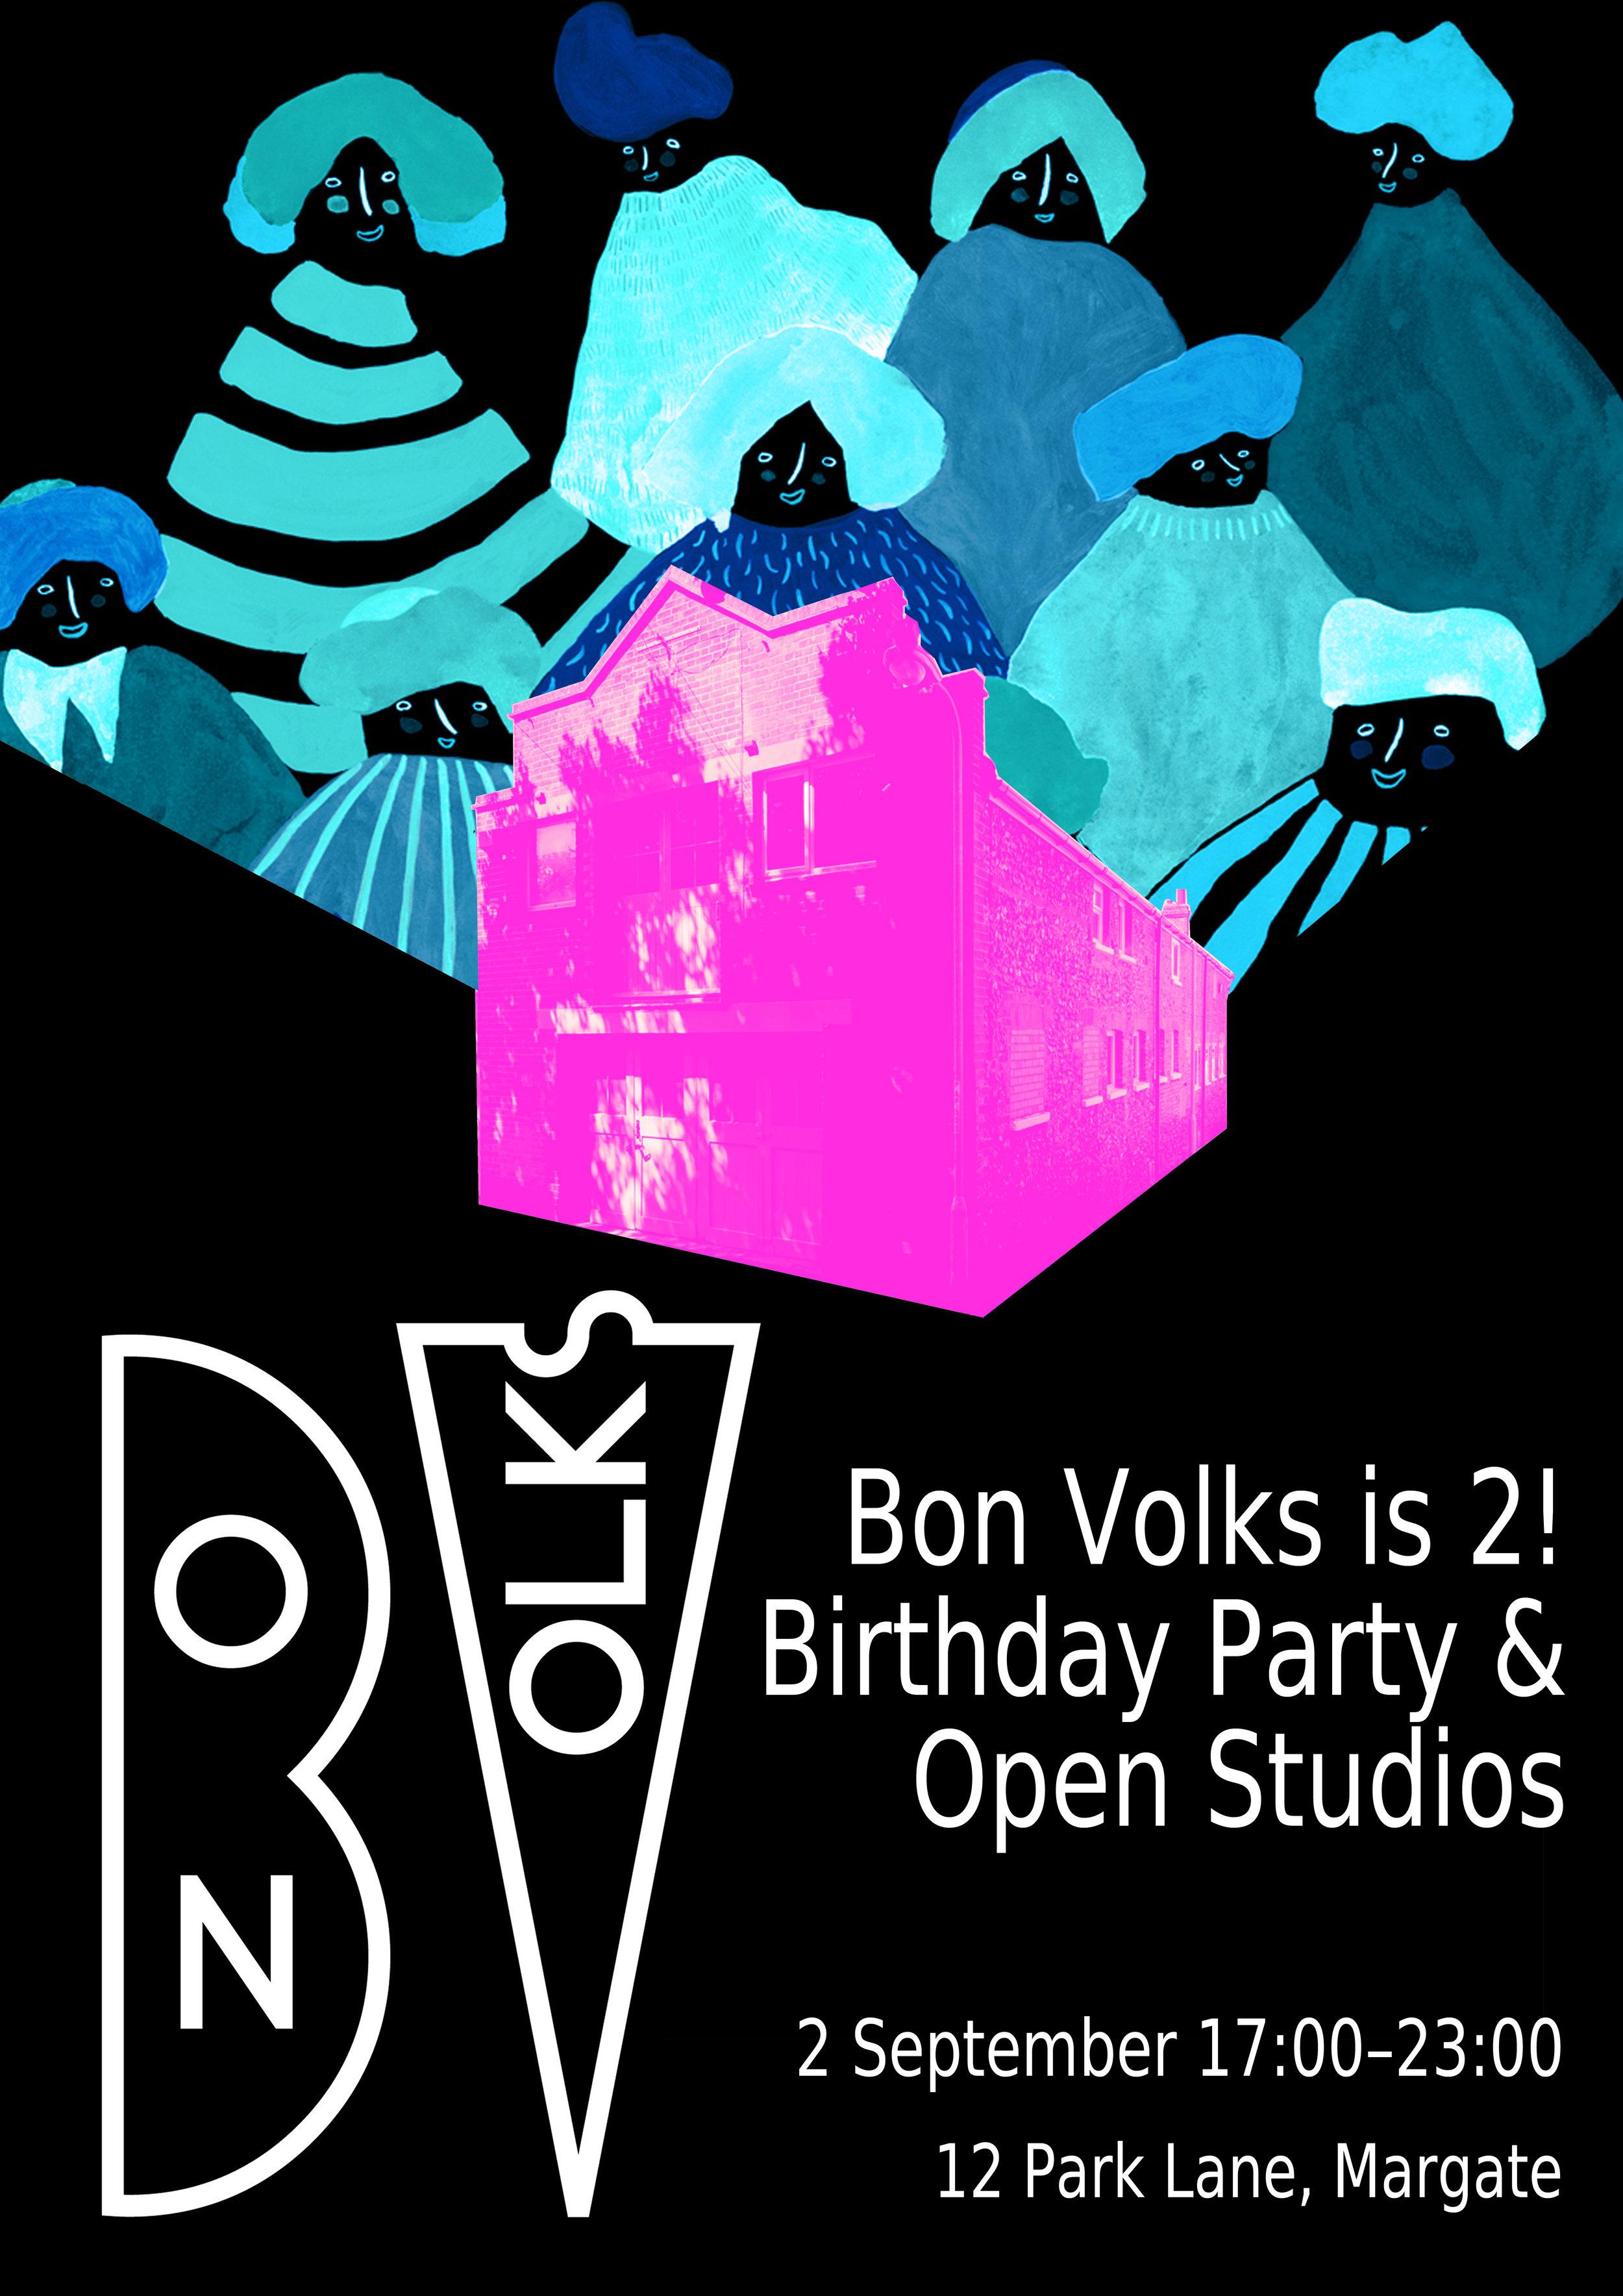 Bon Volks Studio Birthday Party